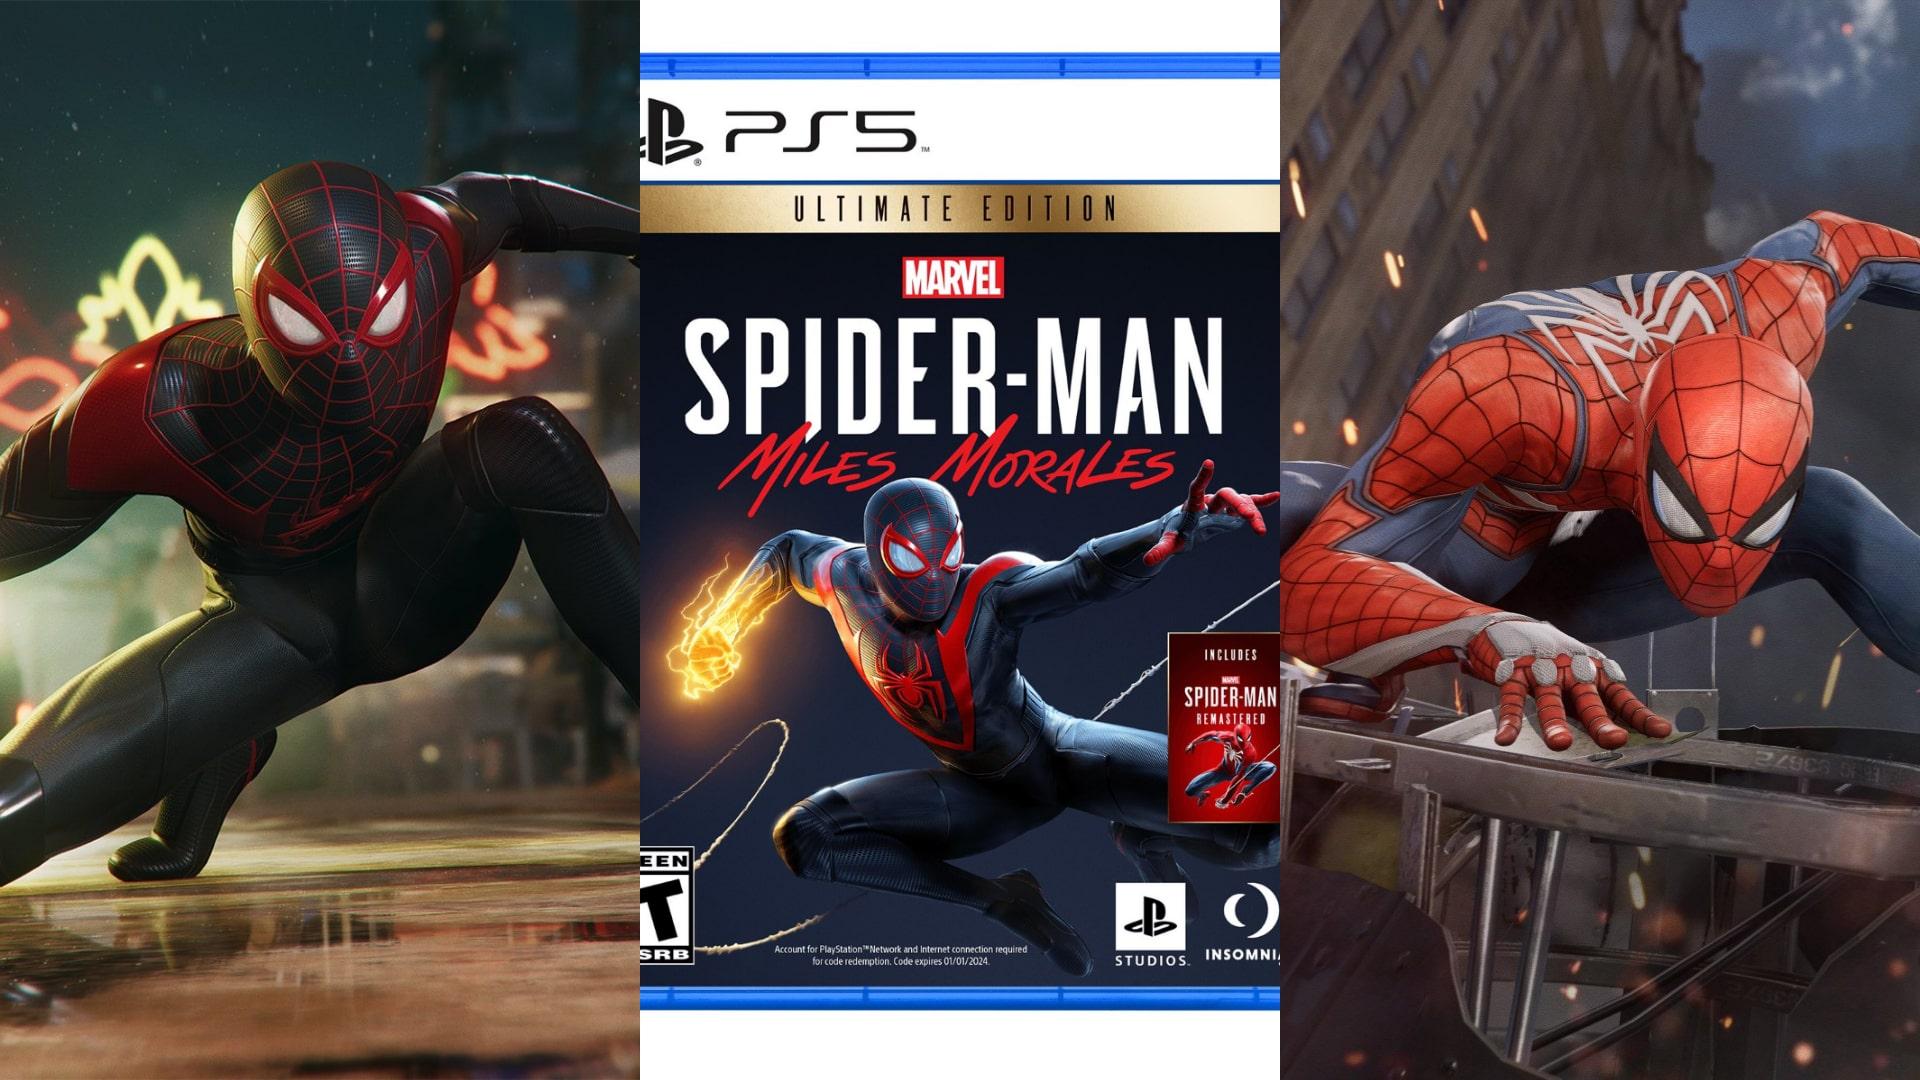 Spiderman PS4 Spiderman Miles Morales PS5 النسخة المطلقة